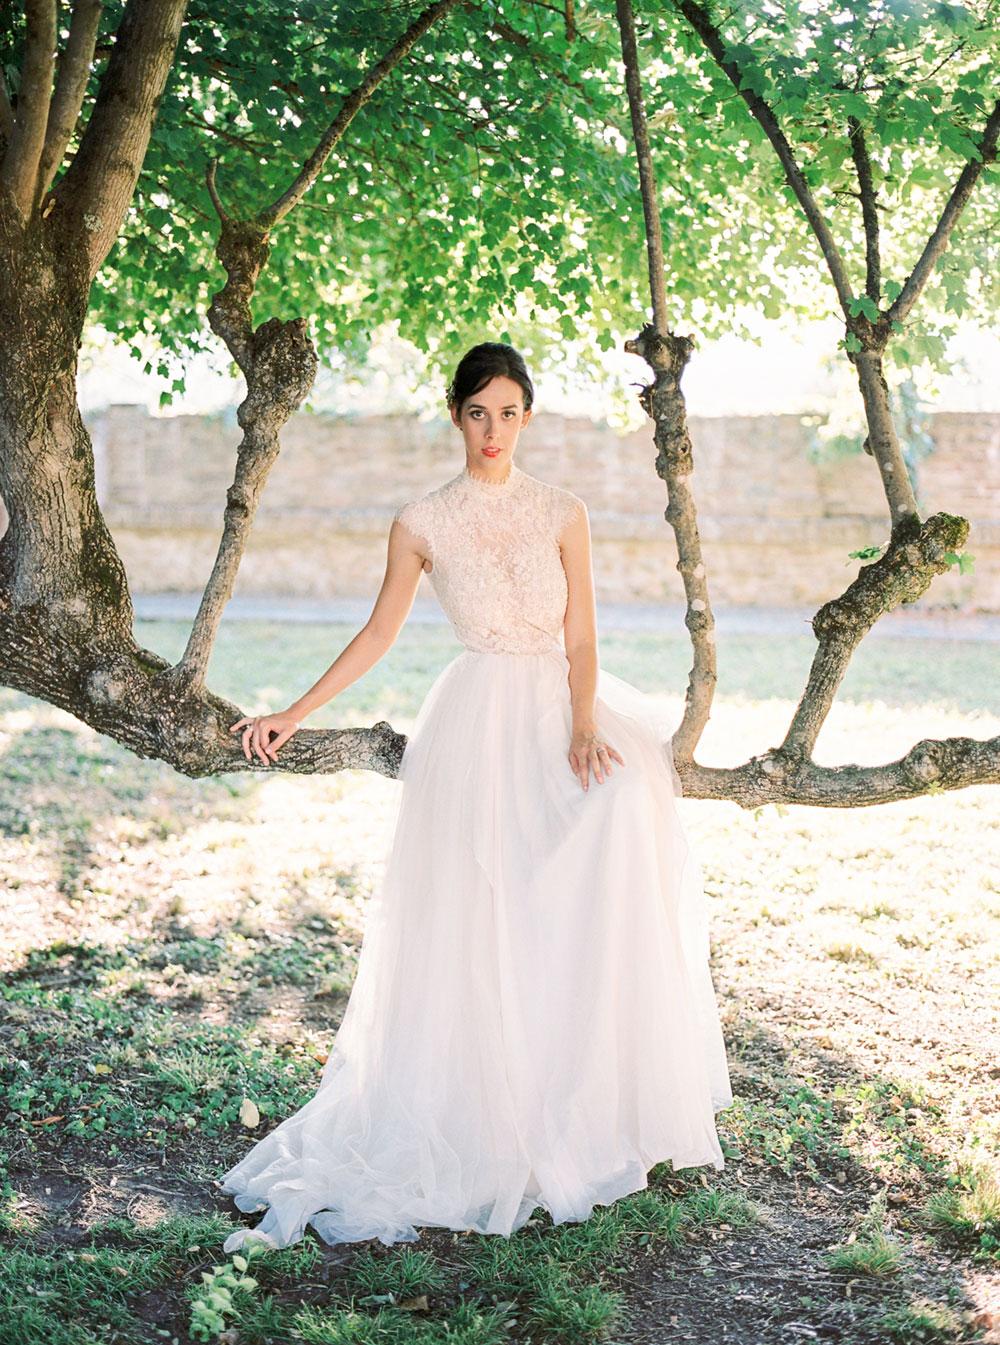 Linari-Tuscany-Elopement-Courtney-Michaela-269